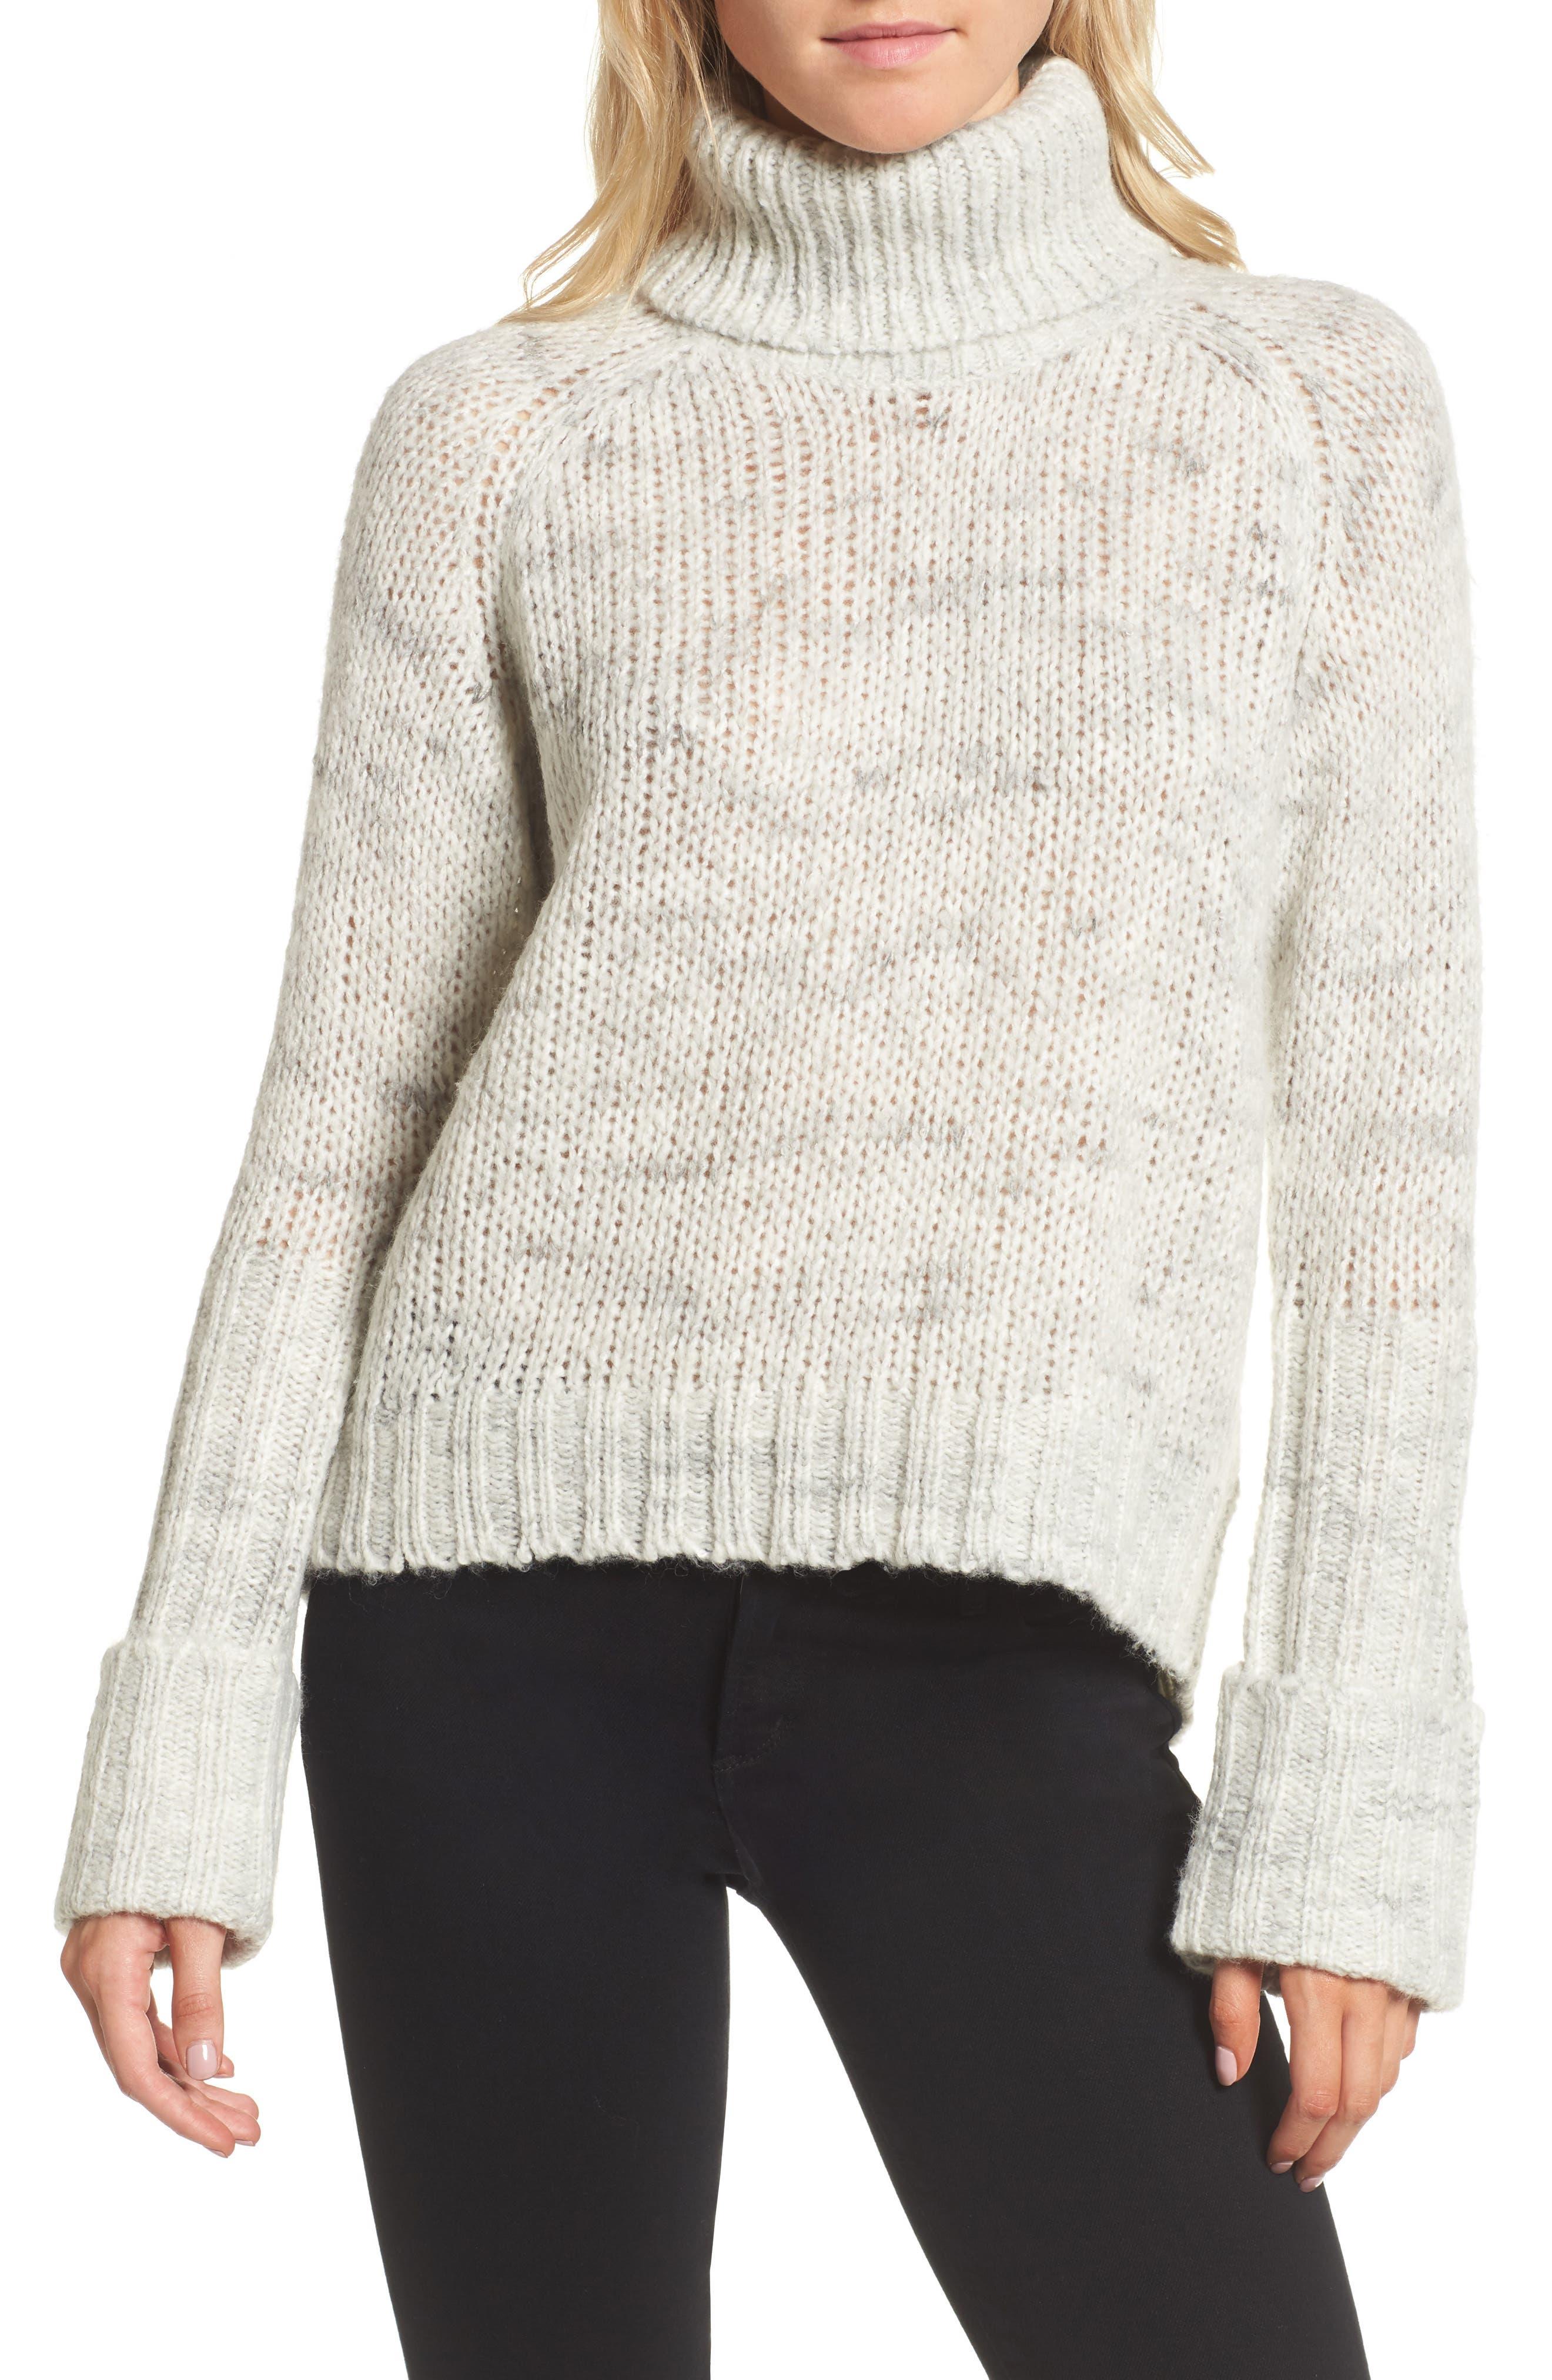 Main Image - Pam & Gela Turtleneck Sweater